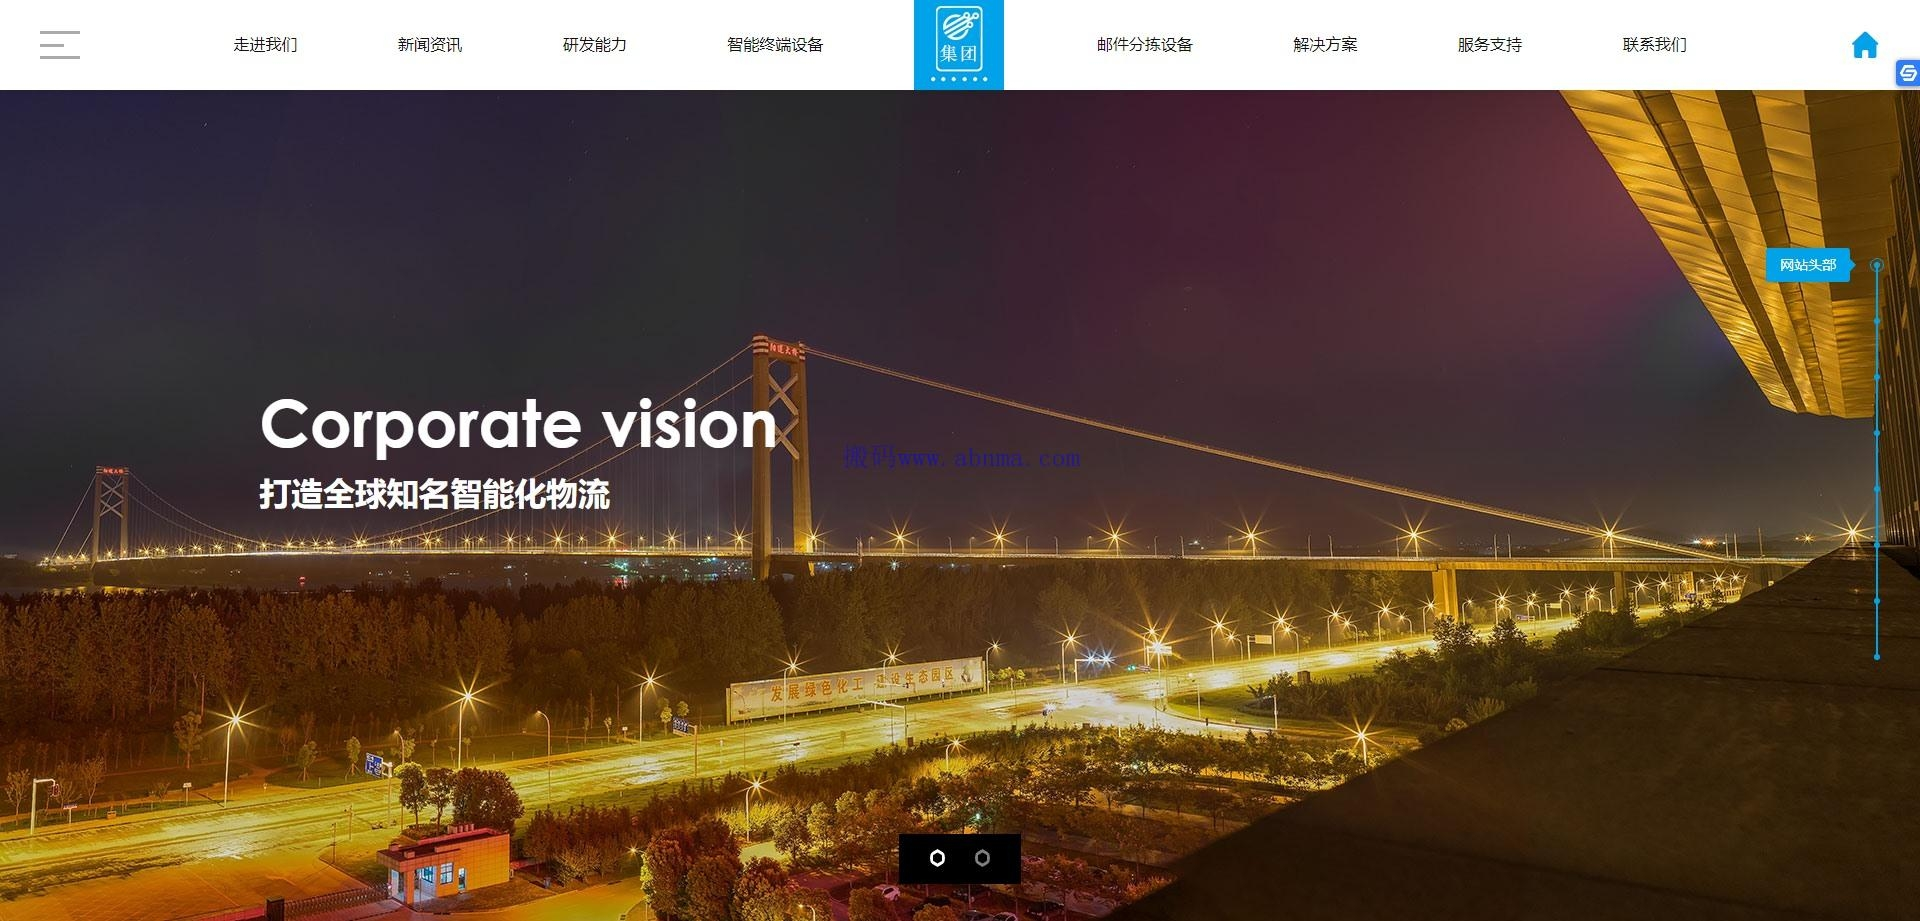 dedecms织梦模板HTML5滚屏智能化物流设备网站模板[自适应手机版]